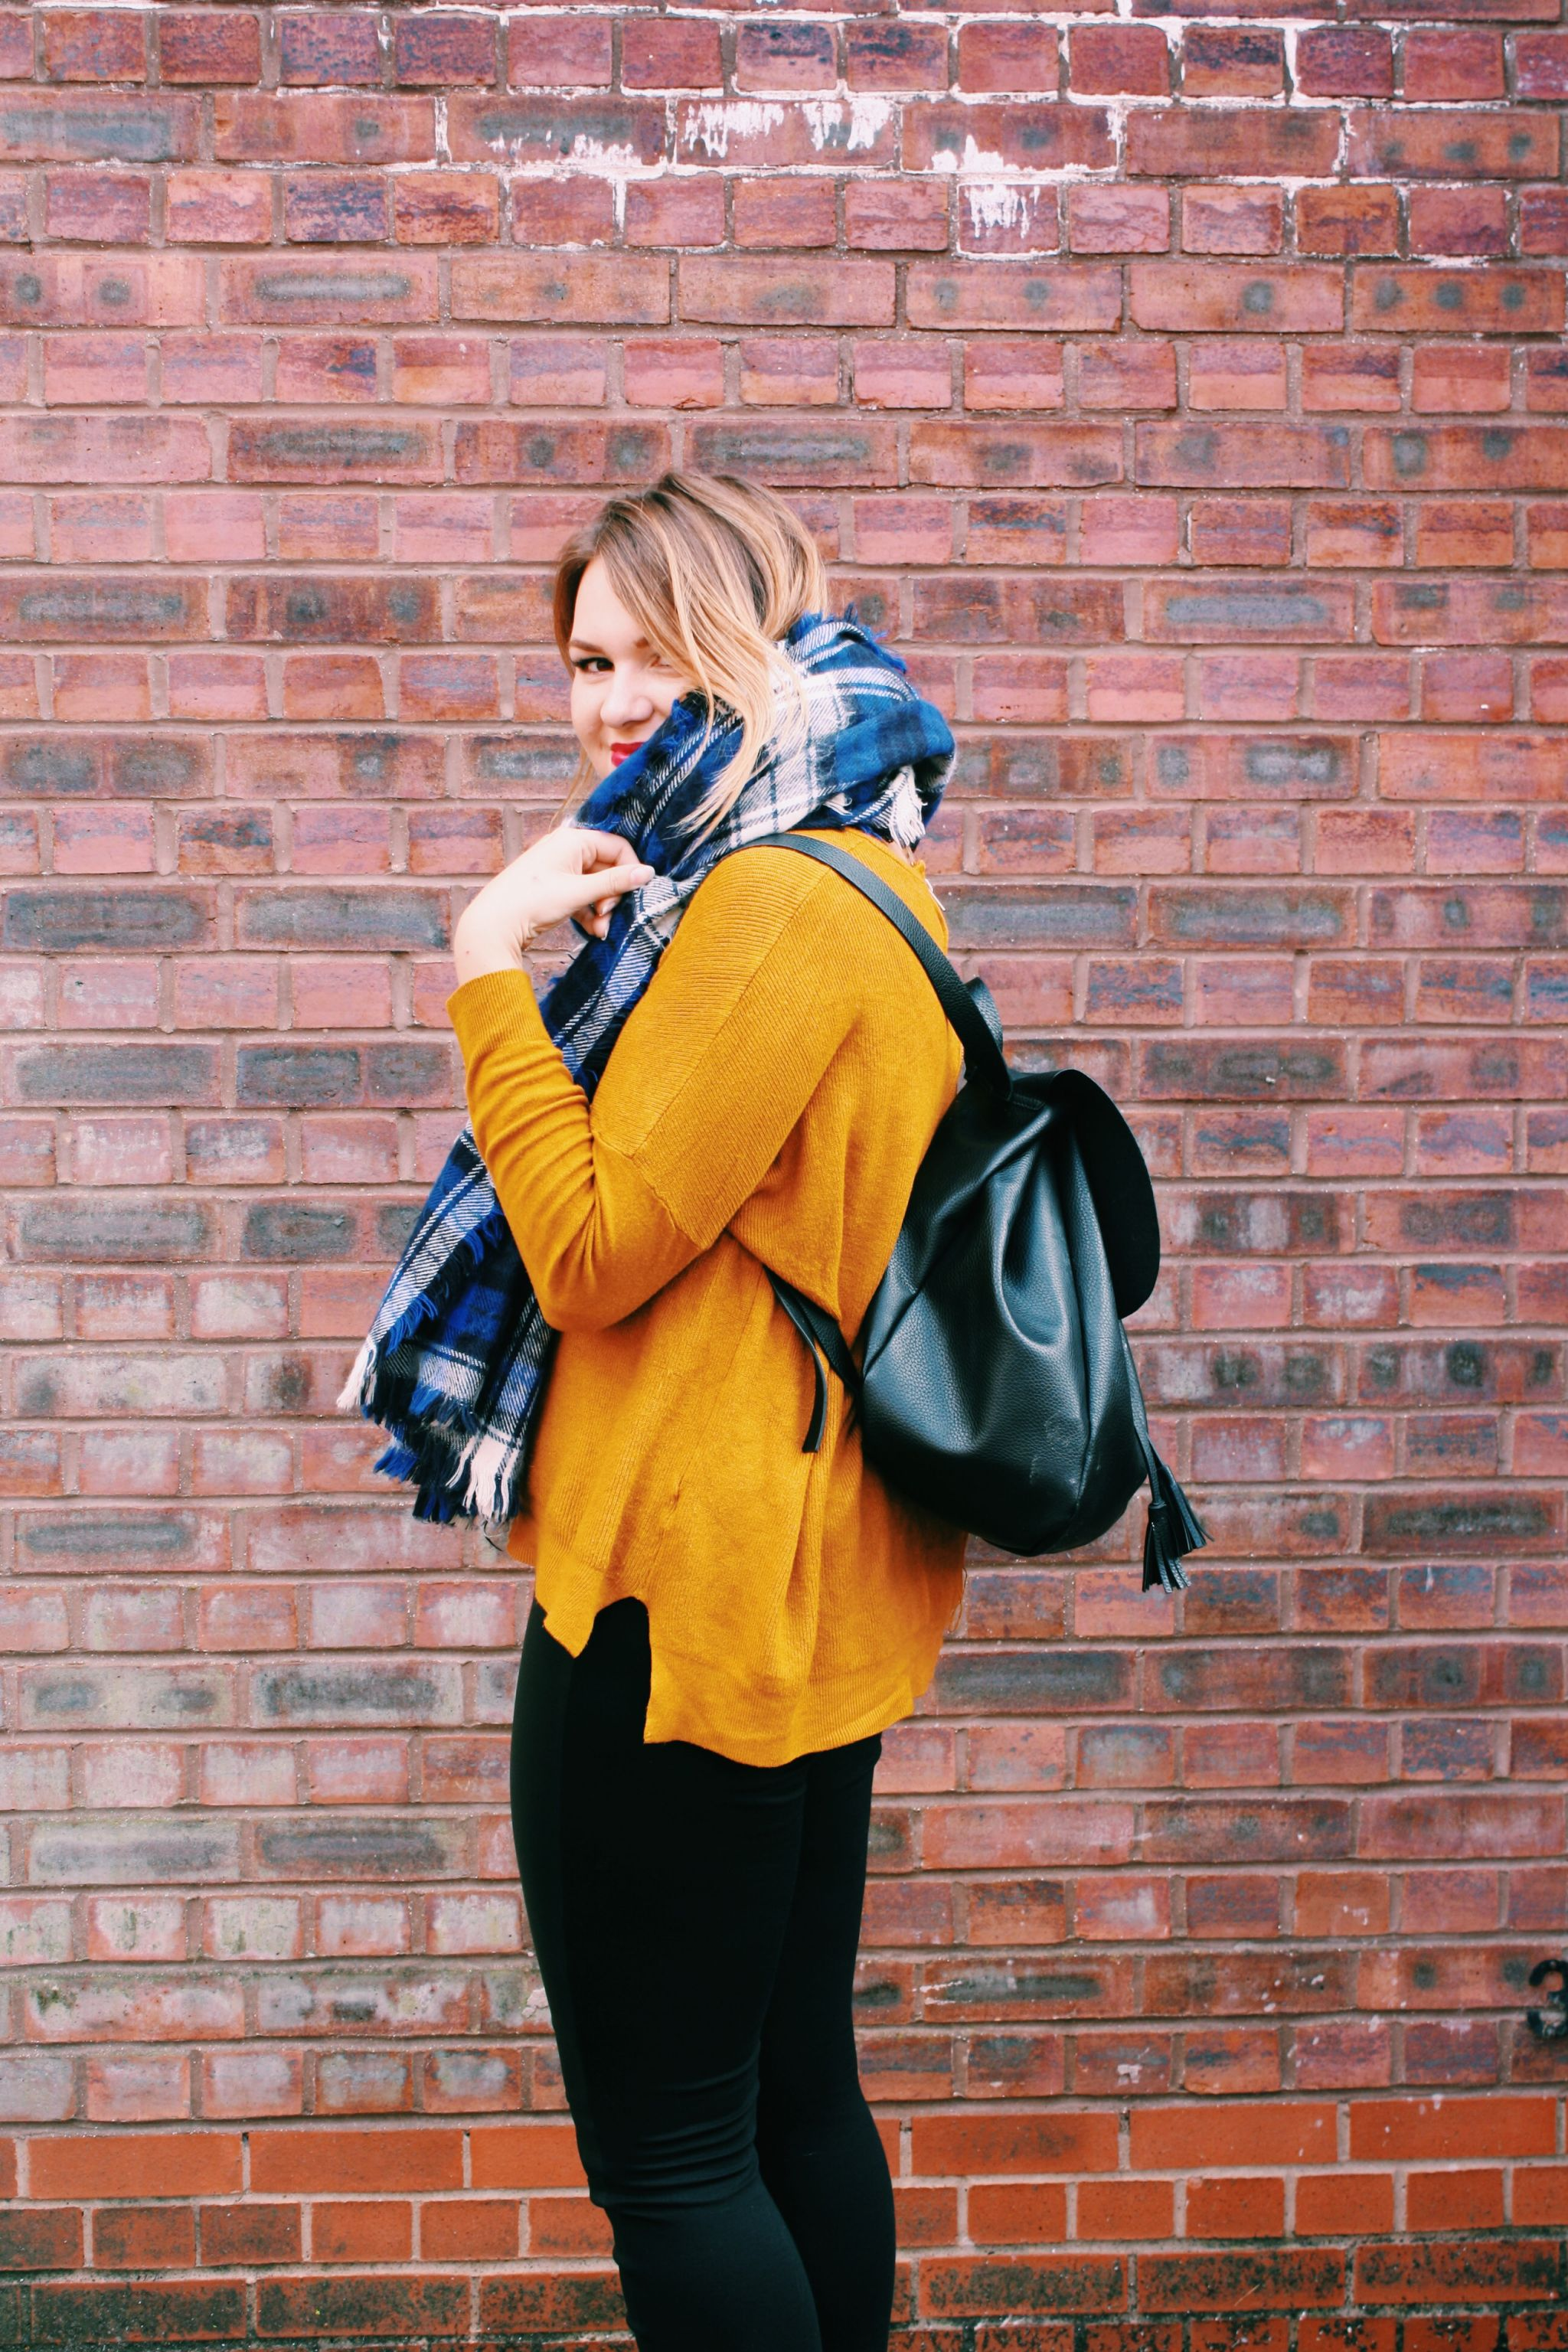 Mustard, Violet Glenton, OOTD, FashionBlogger